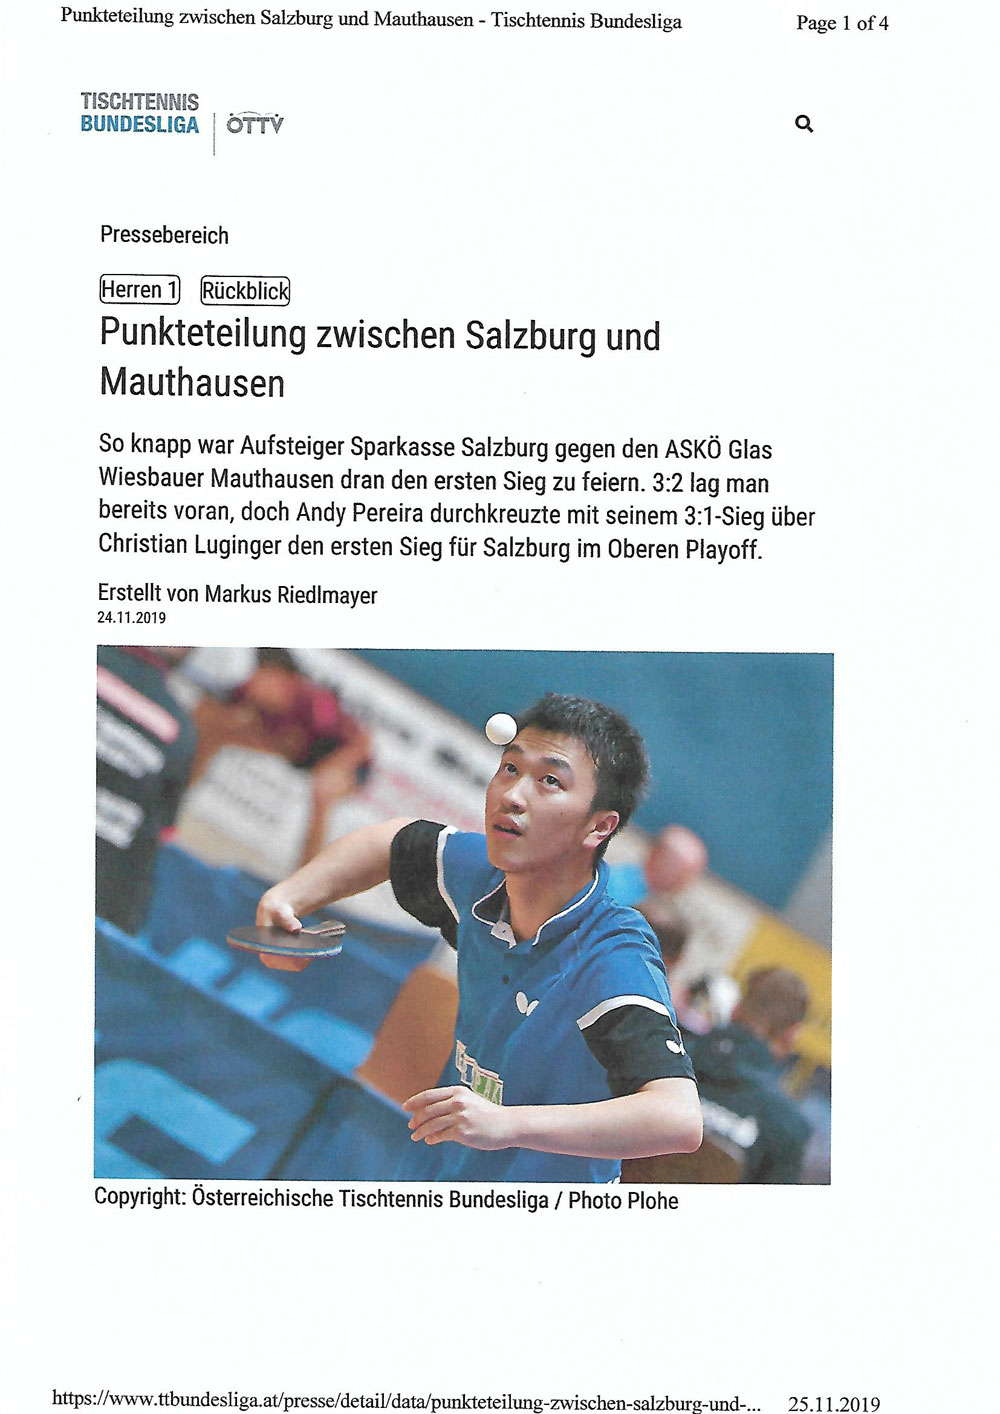 Pressebericht der Bundesliga 24.11.2019